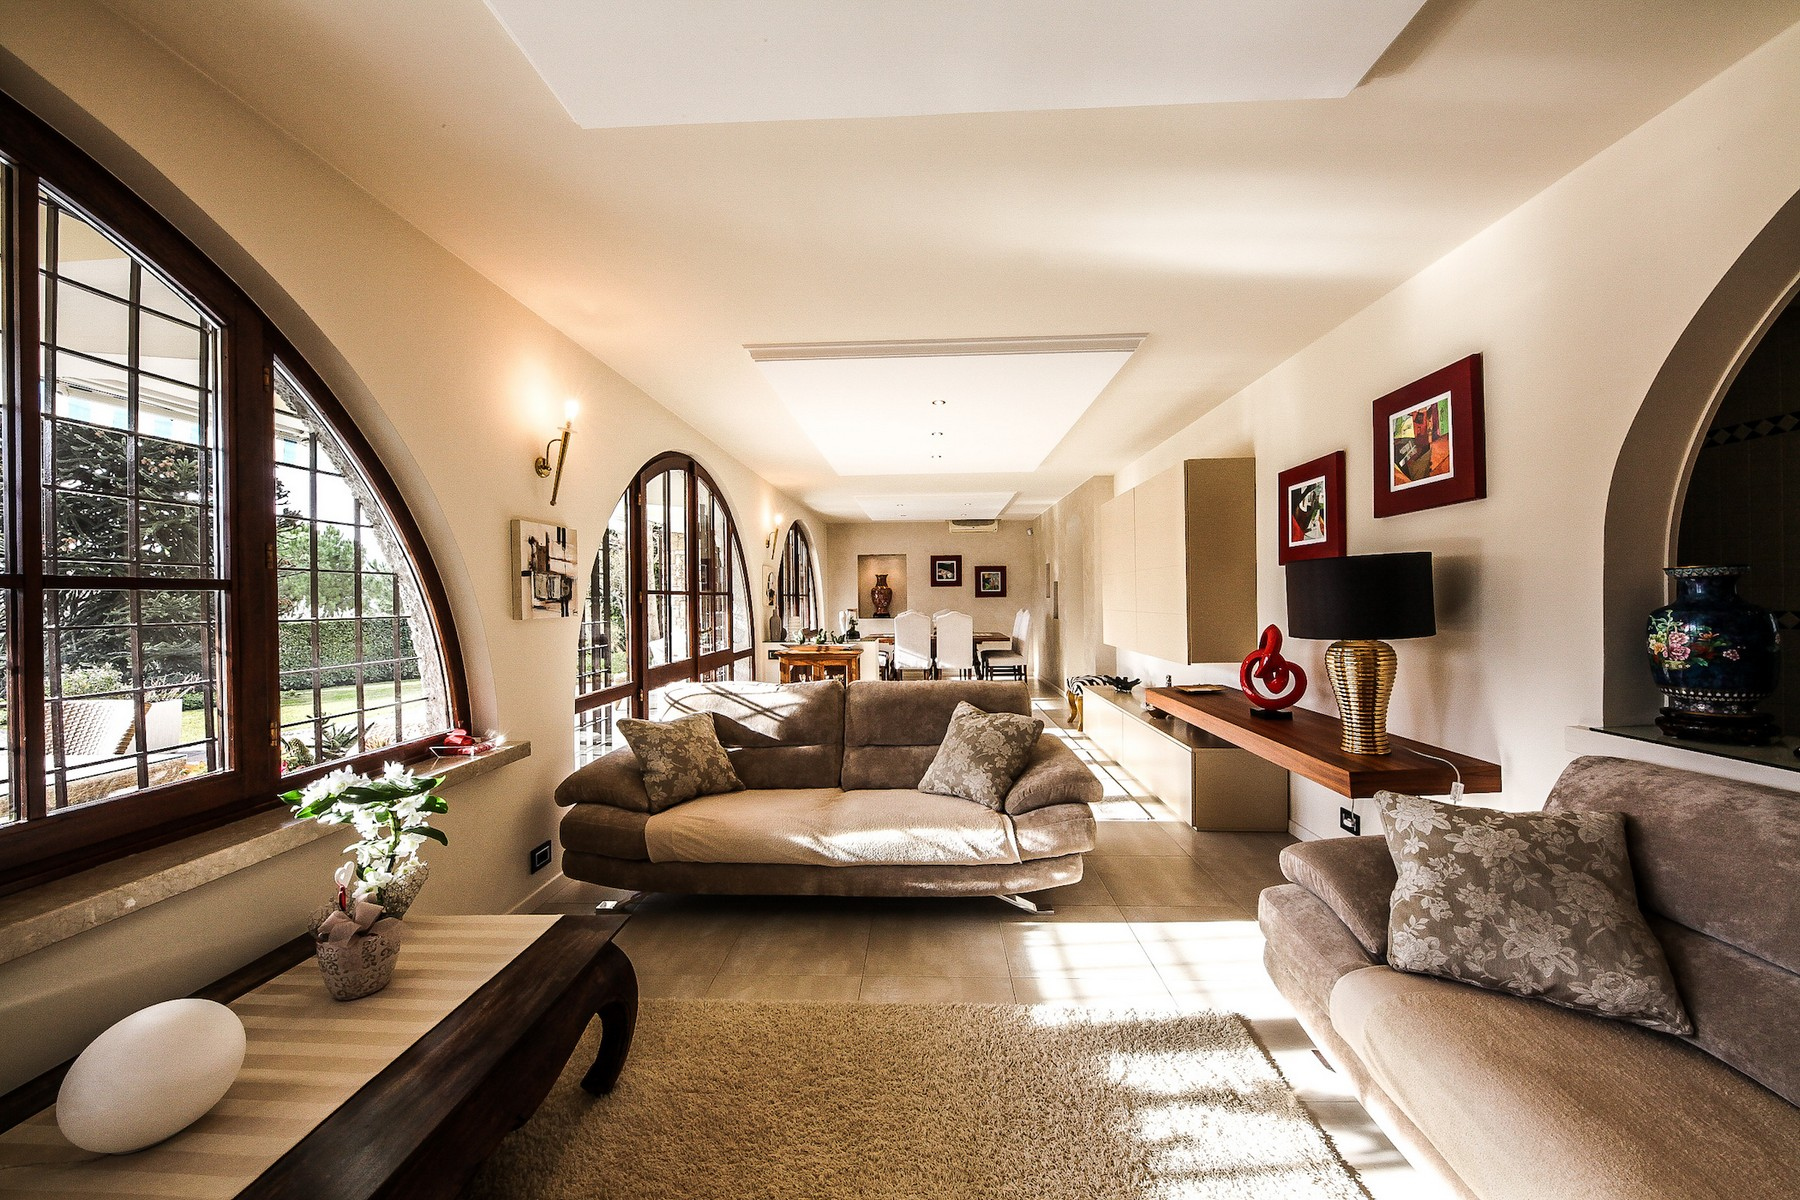 Villa in Vendita a Padenghe Sul Garda: 5 locali, 330 mq - Foto 2